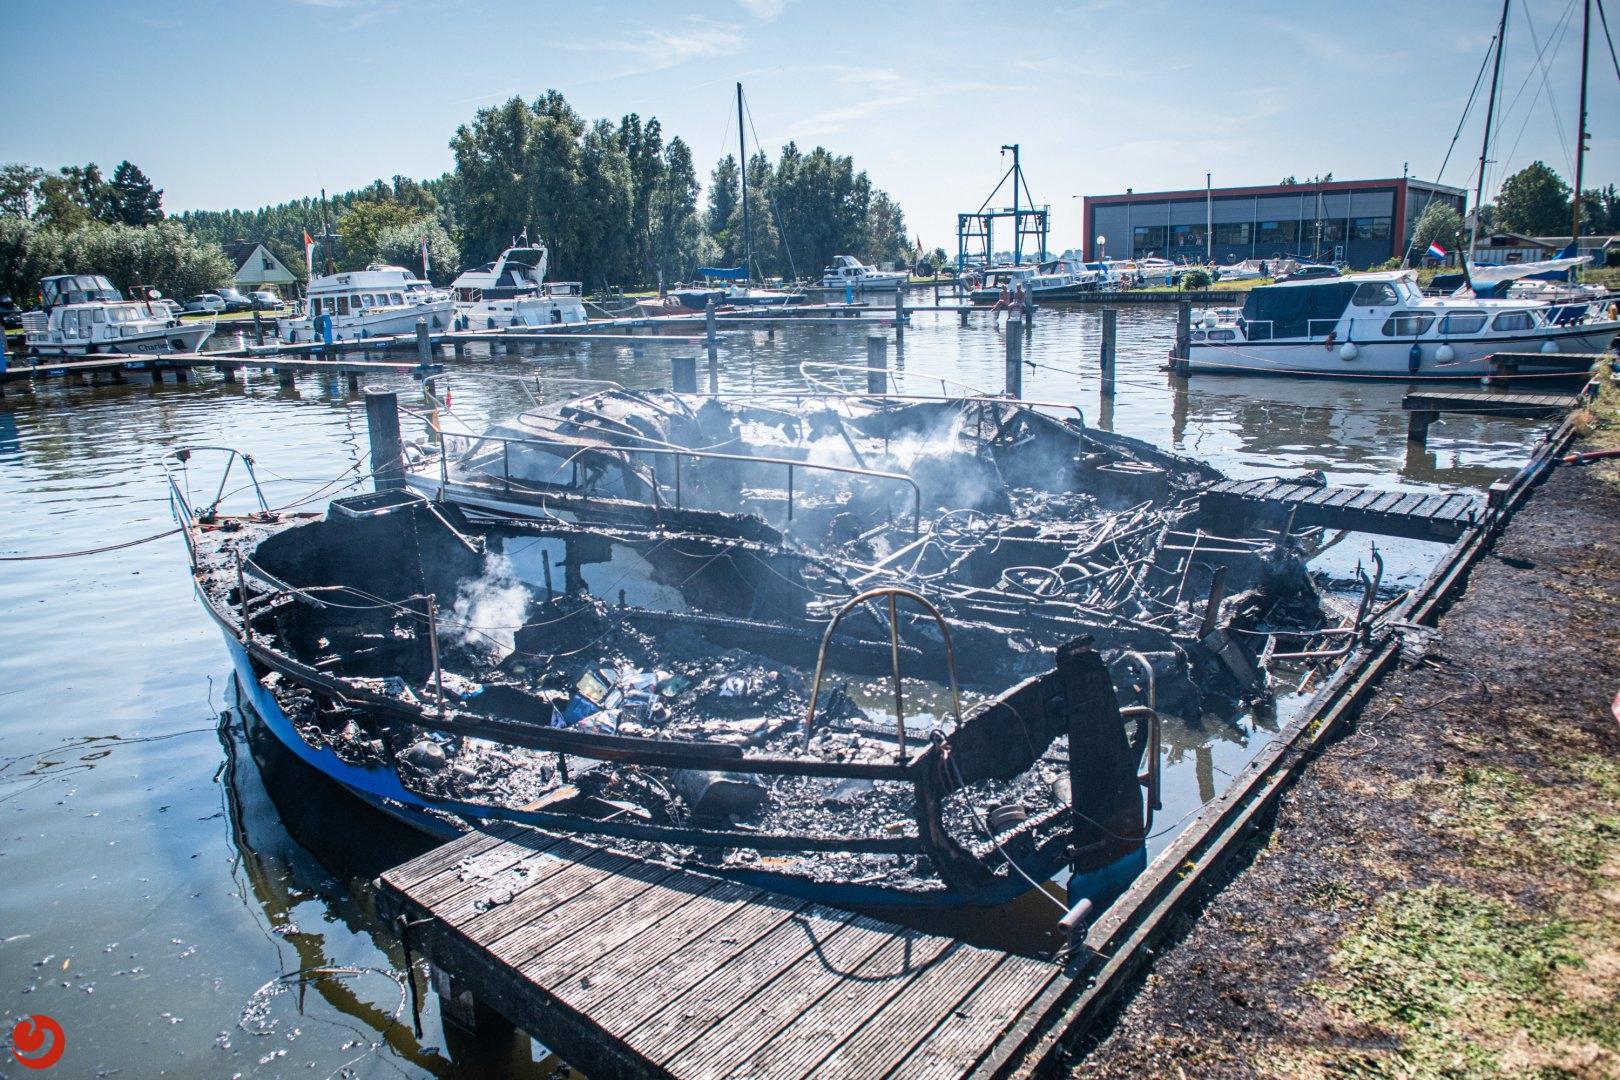 Drie boten uitgebrand in jachthaven